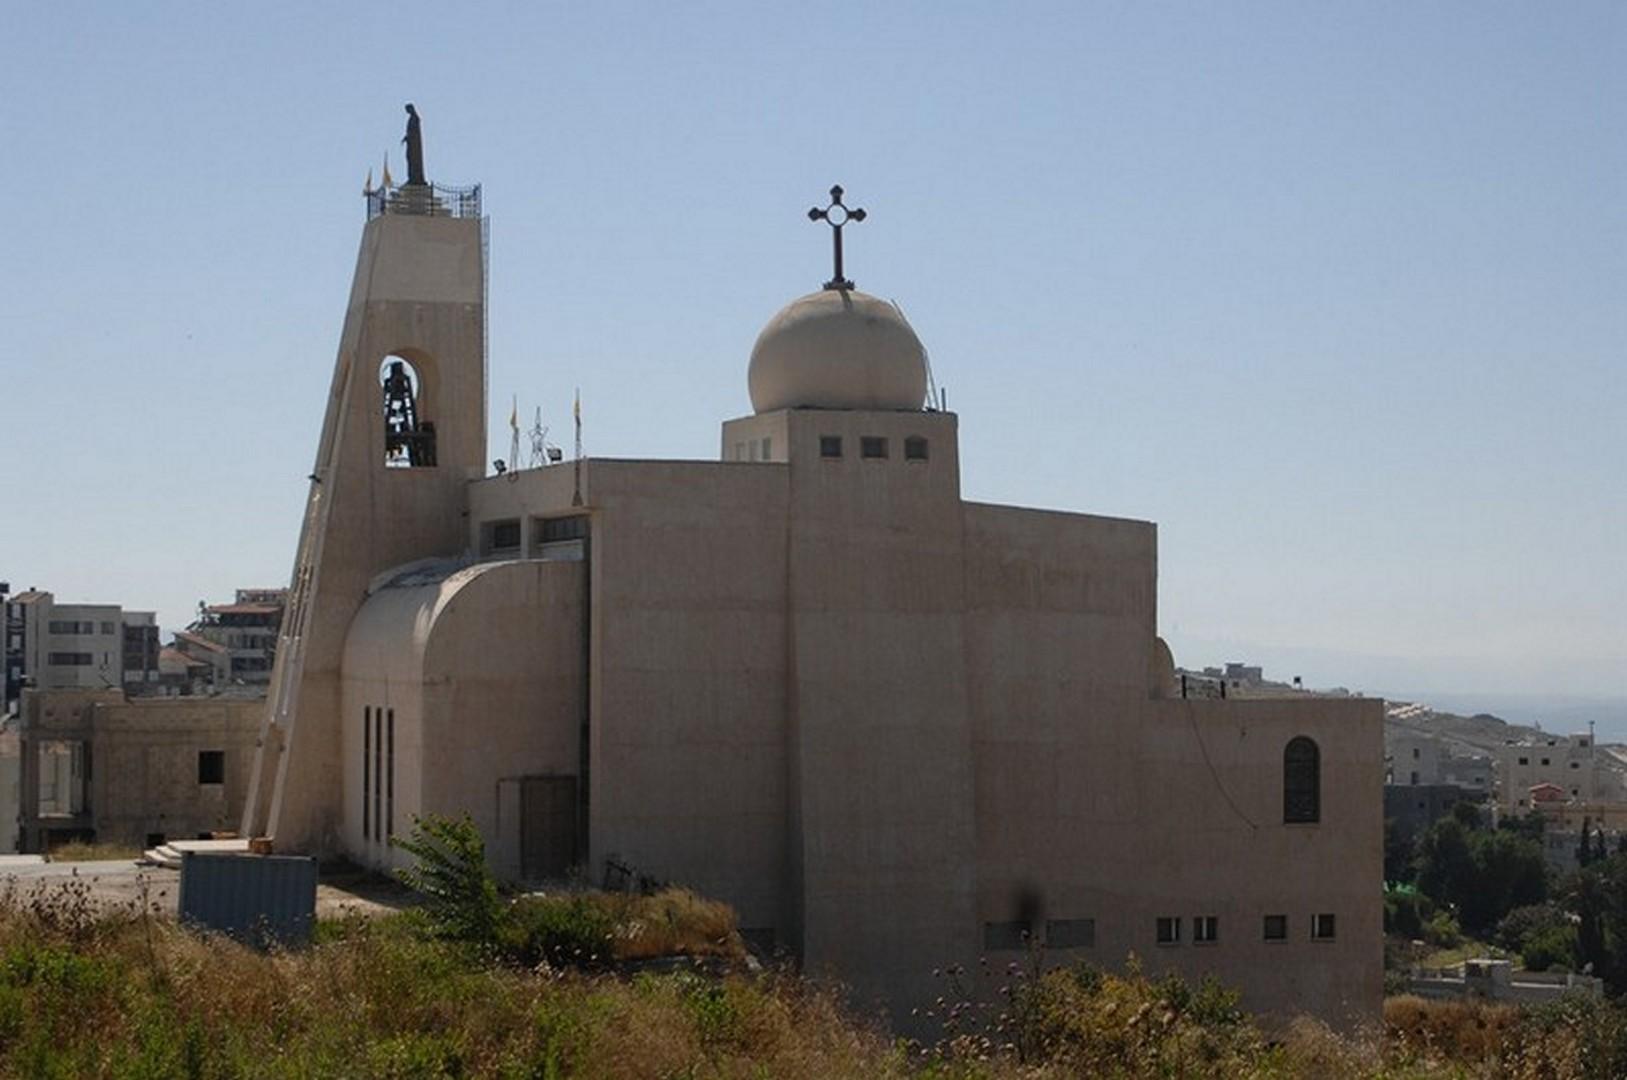 The New Maronite Church